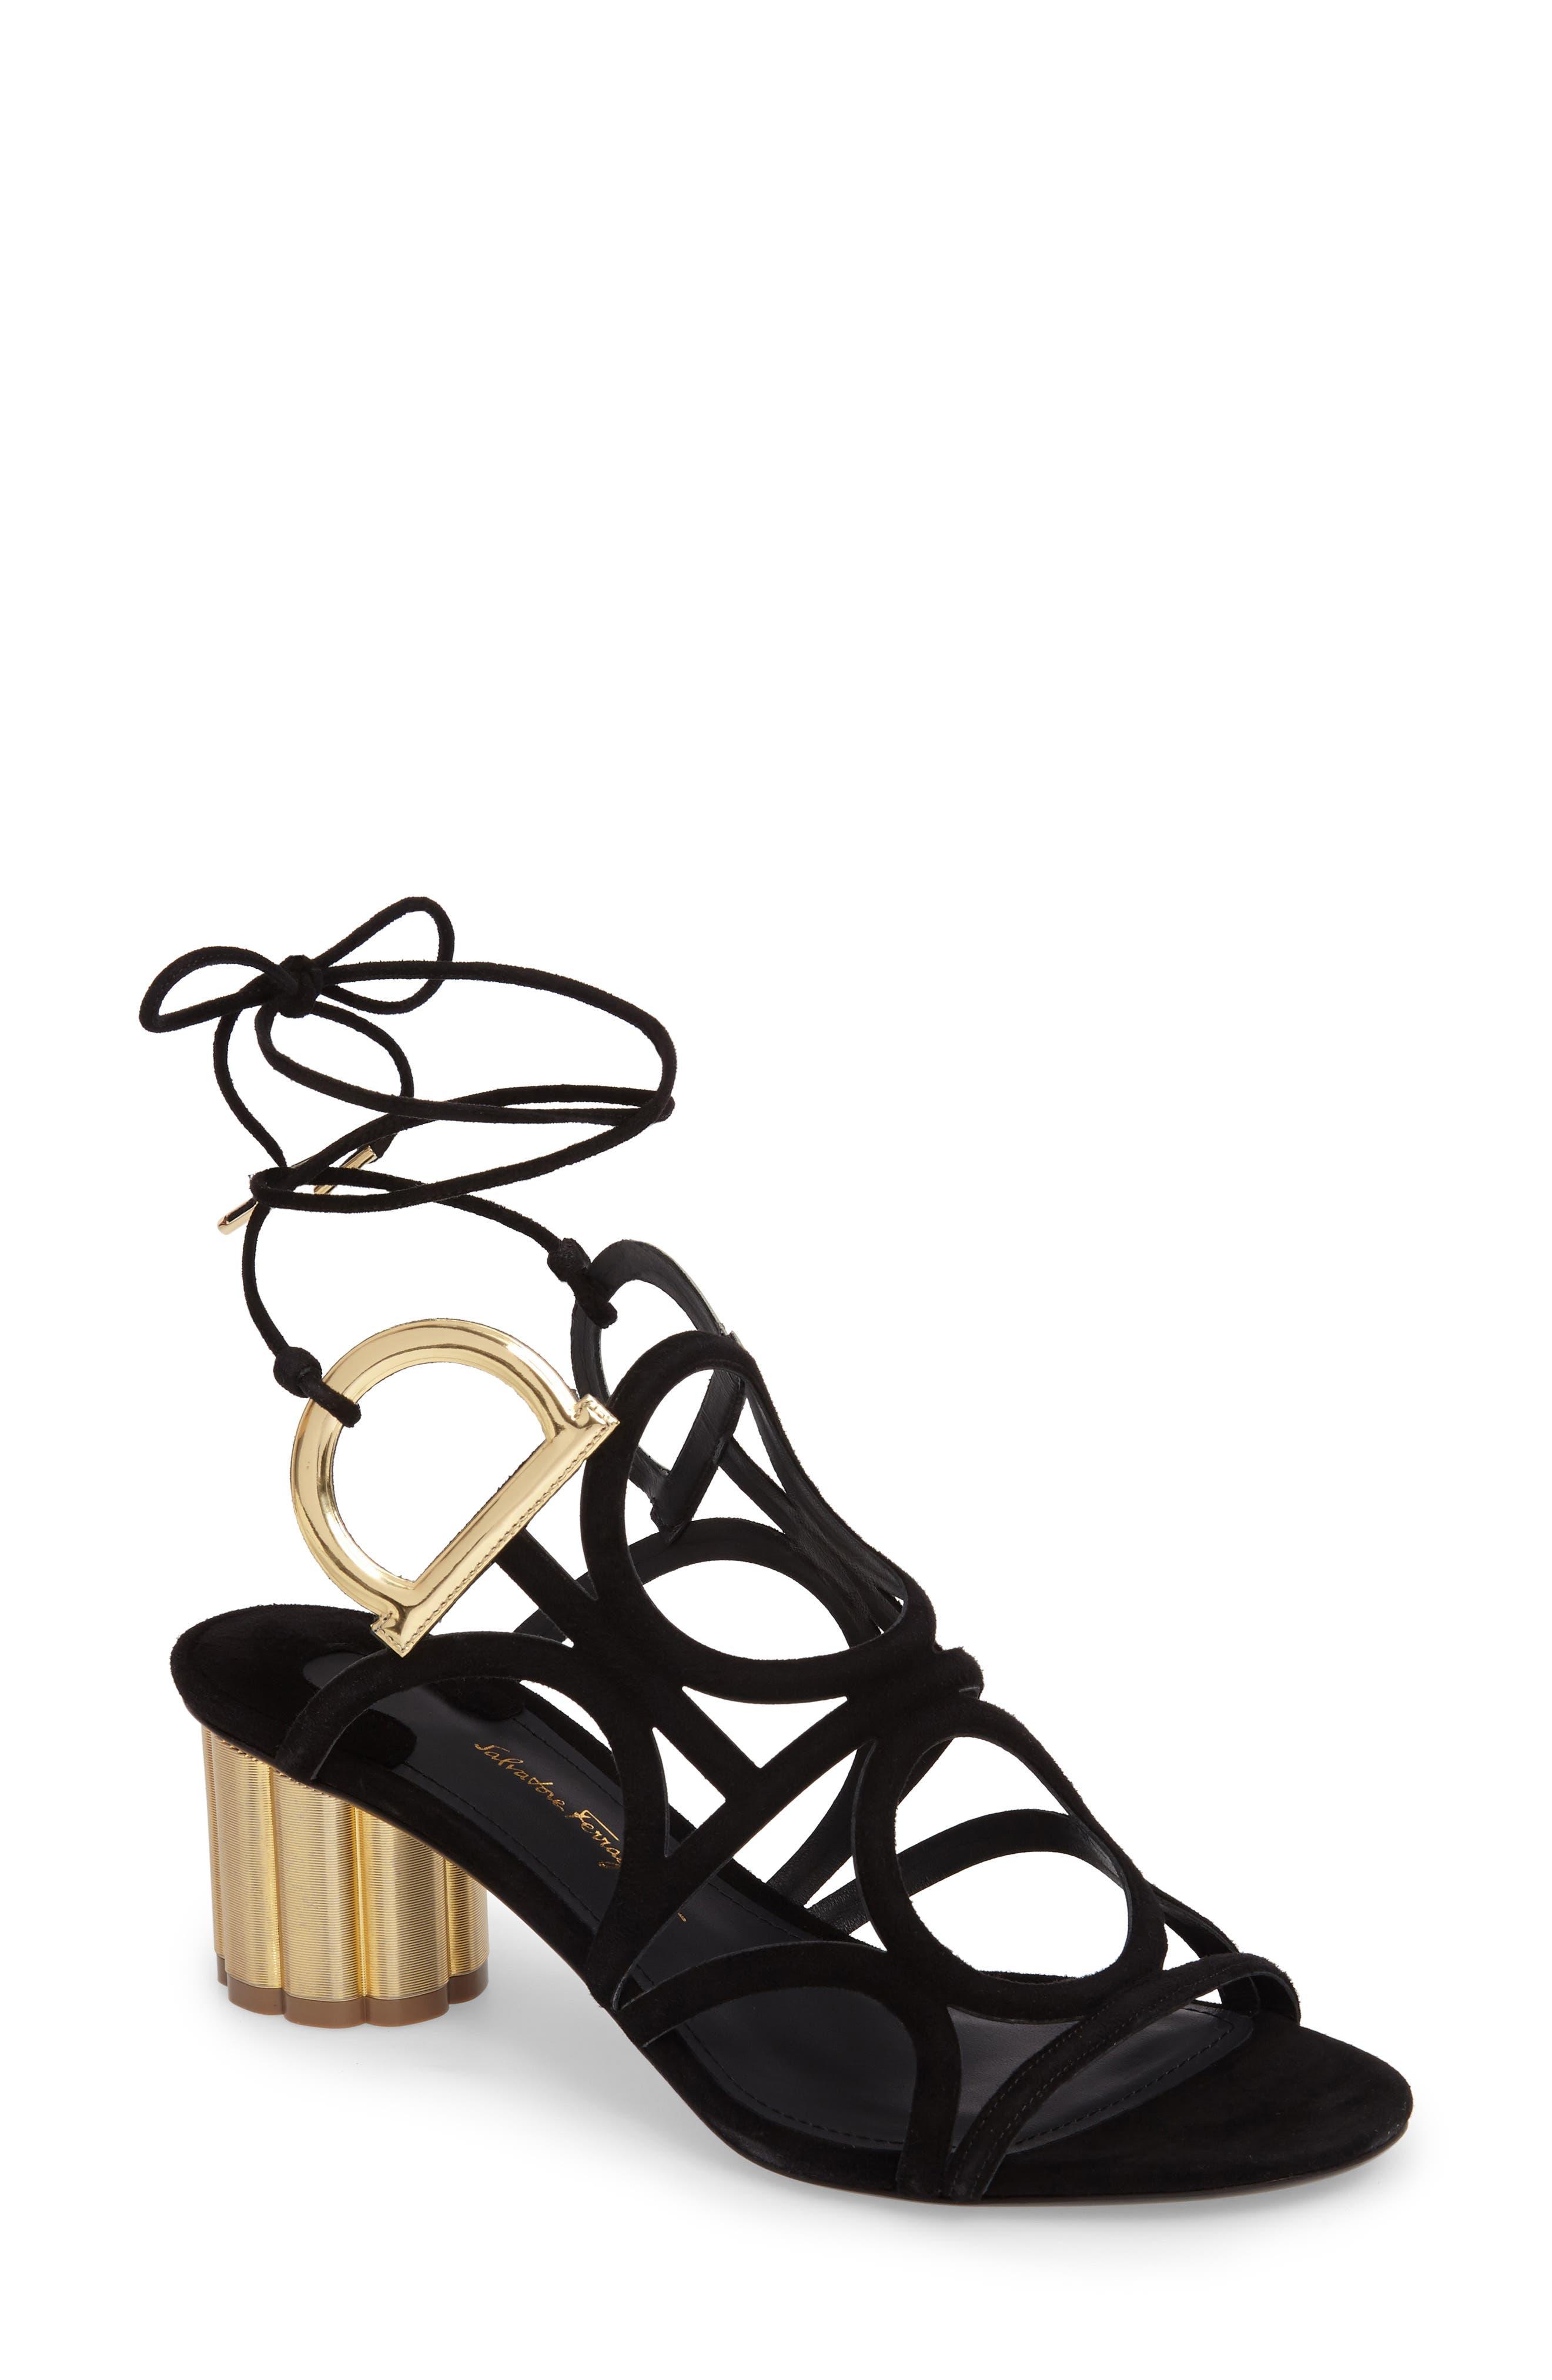 Alternate Image 1 Selected - Salvatore Ferragamo Strappy Block Heel Sandal (Women)